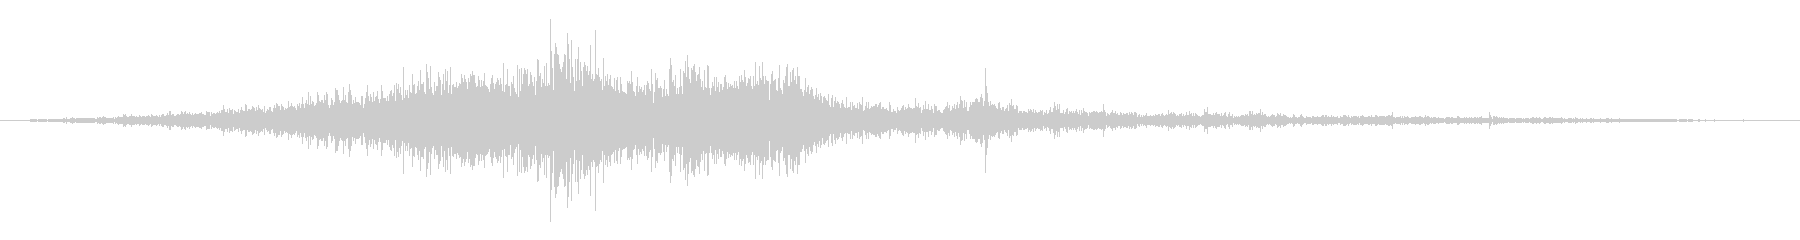 PASS BY、MEDIUM、SP...の未再生の波形